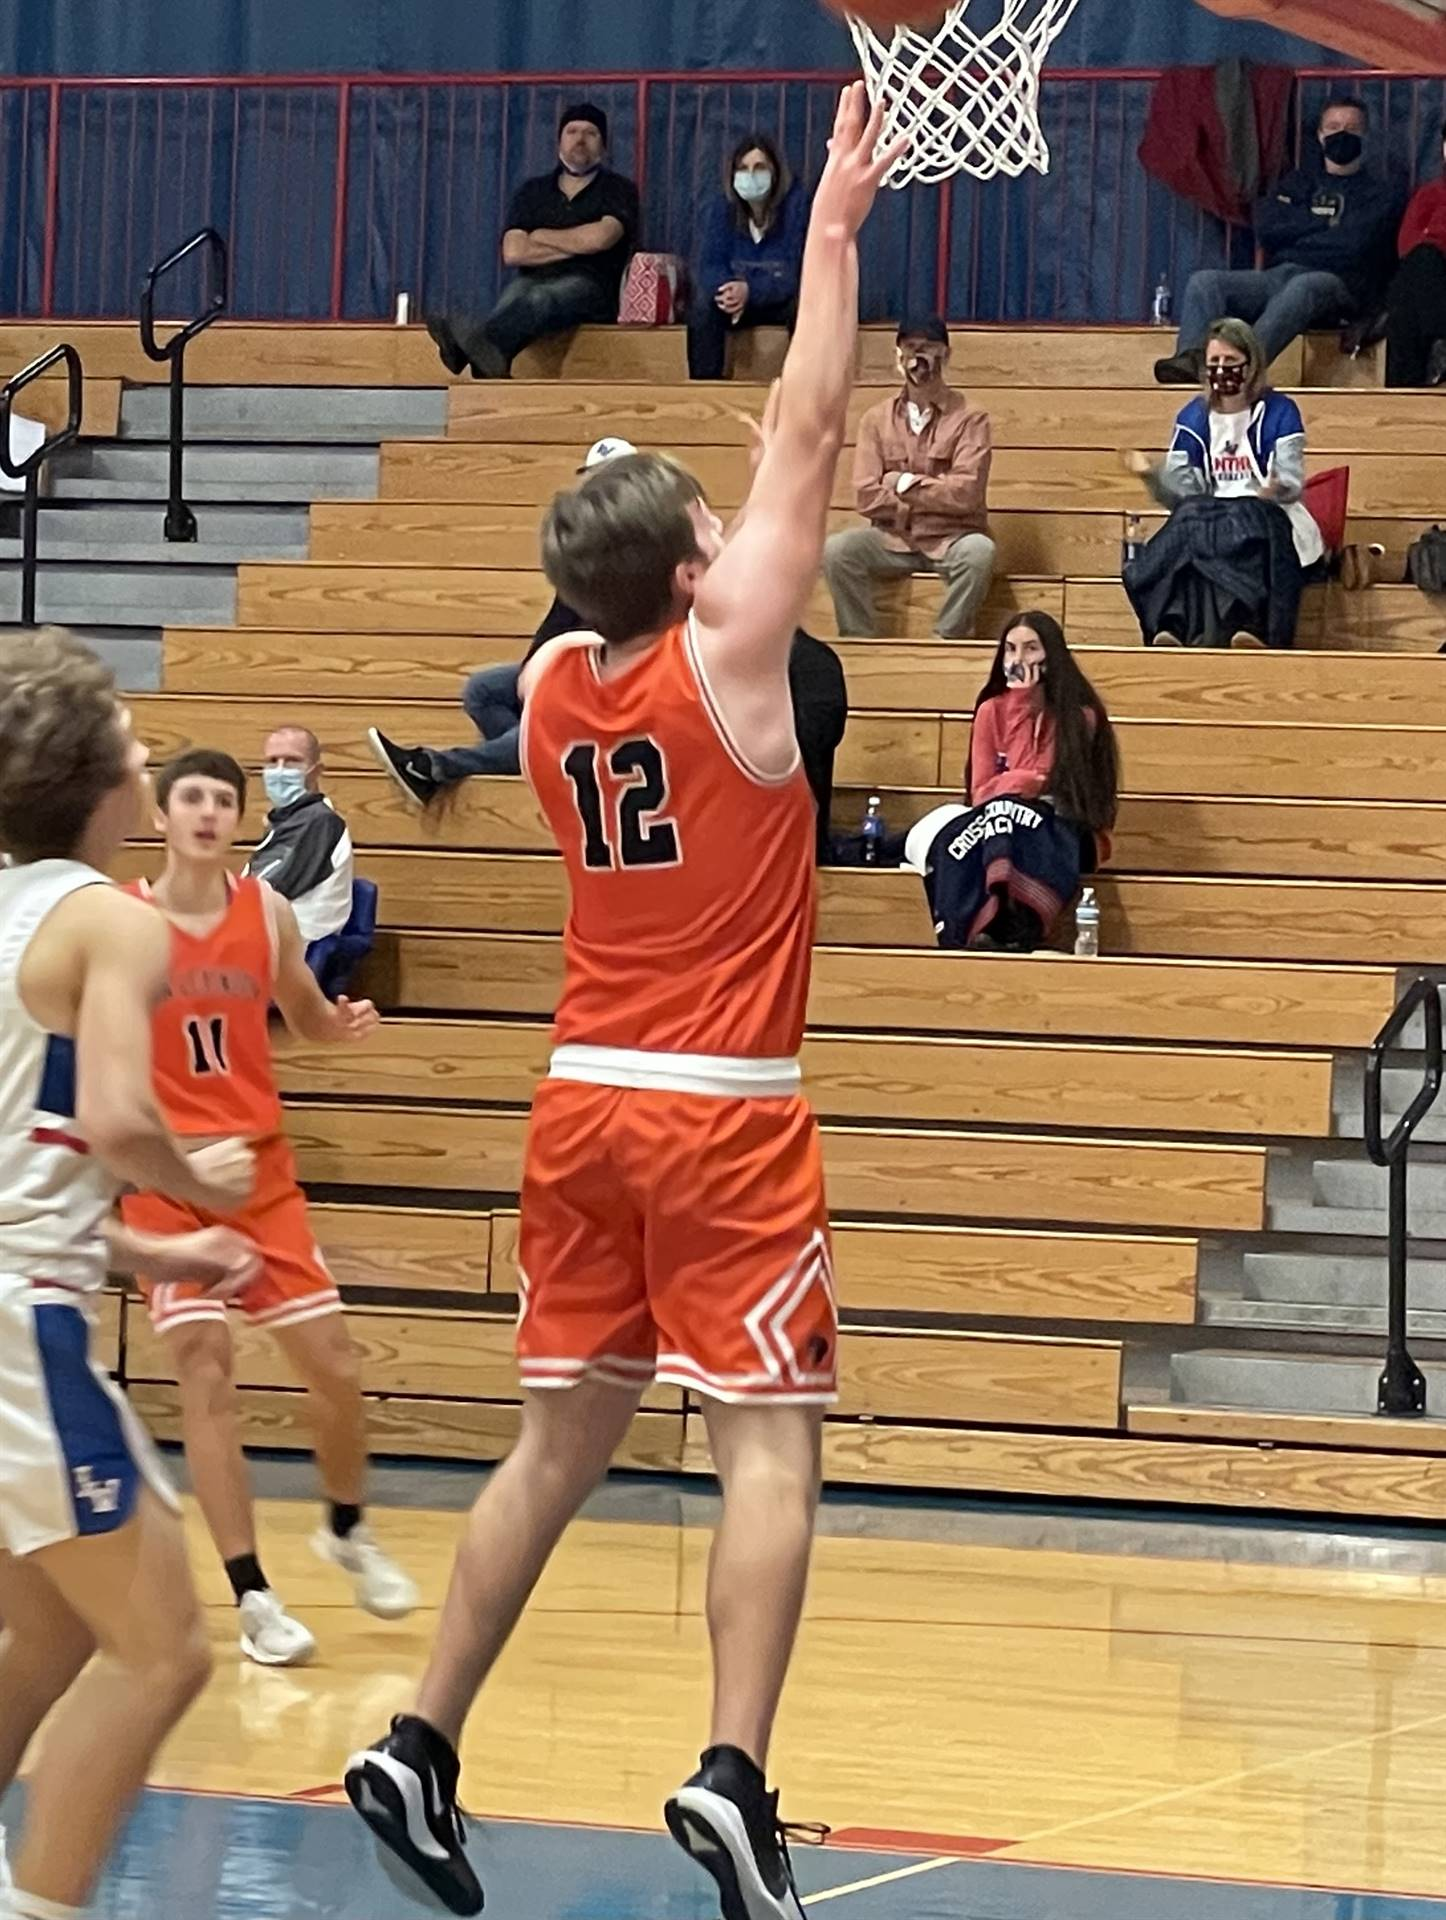 Varsity Basketball taking on Licking Valley